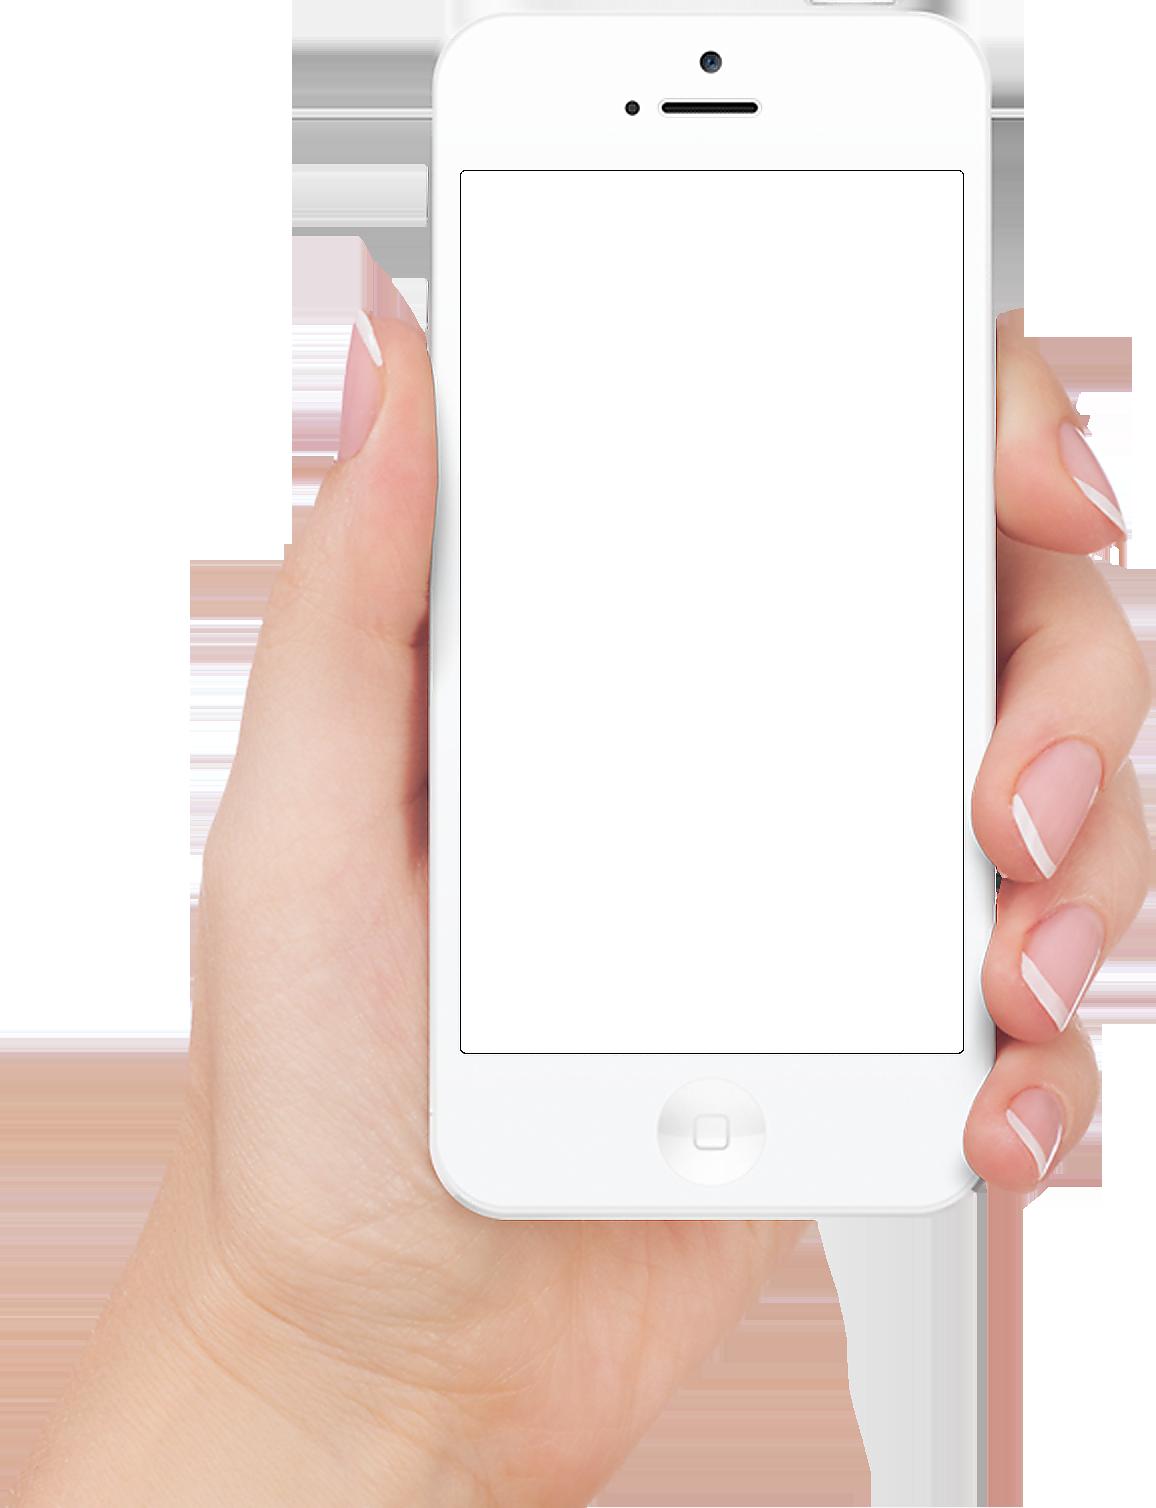 Hands clipart smartphone. Apple iphone in hand